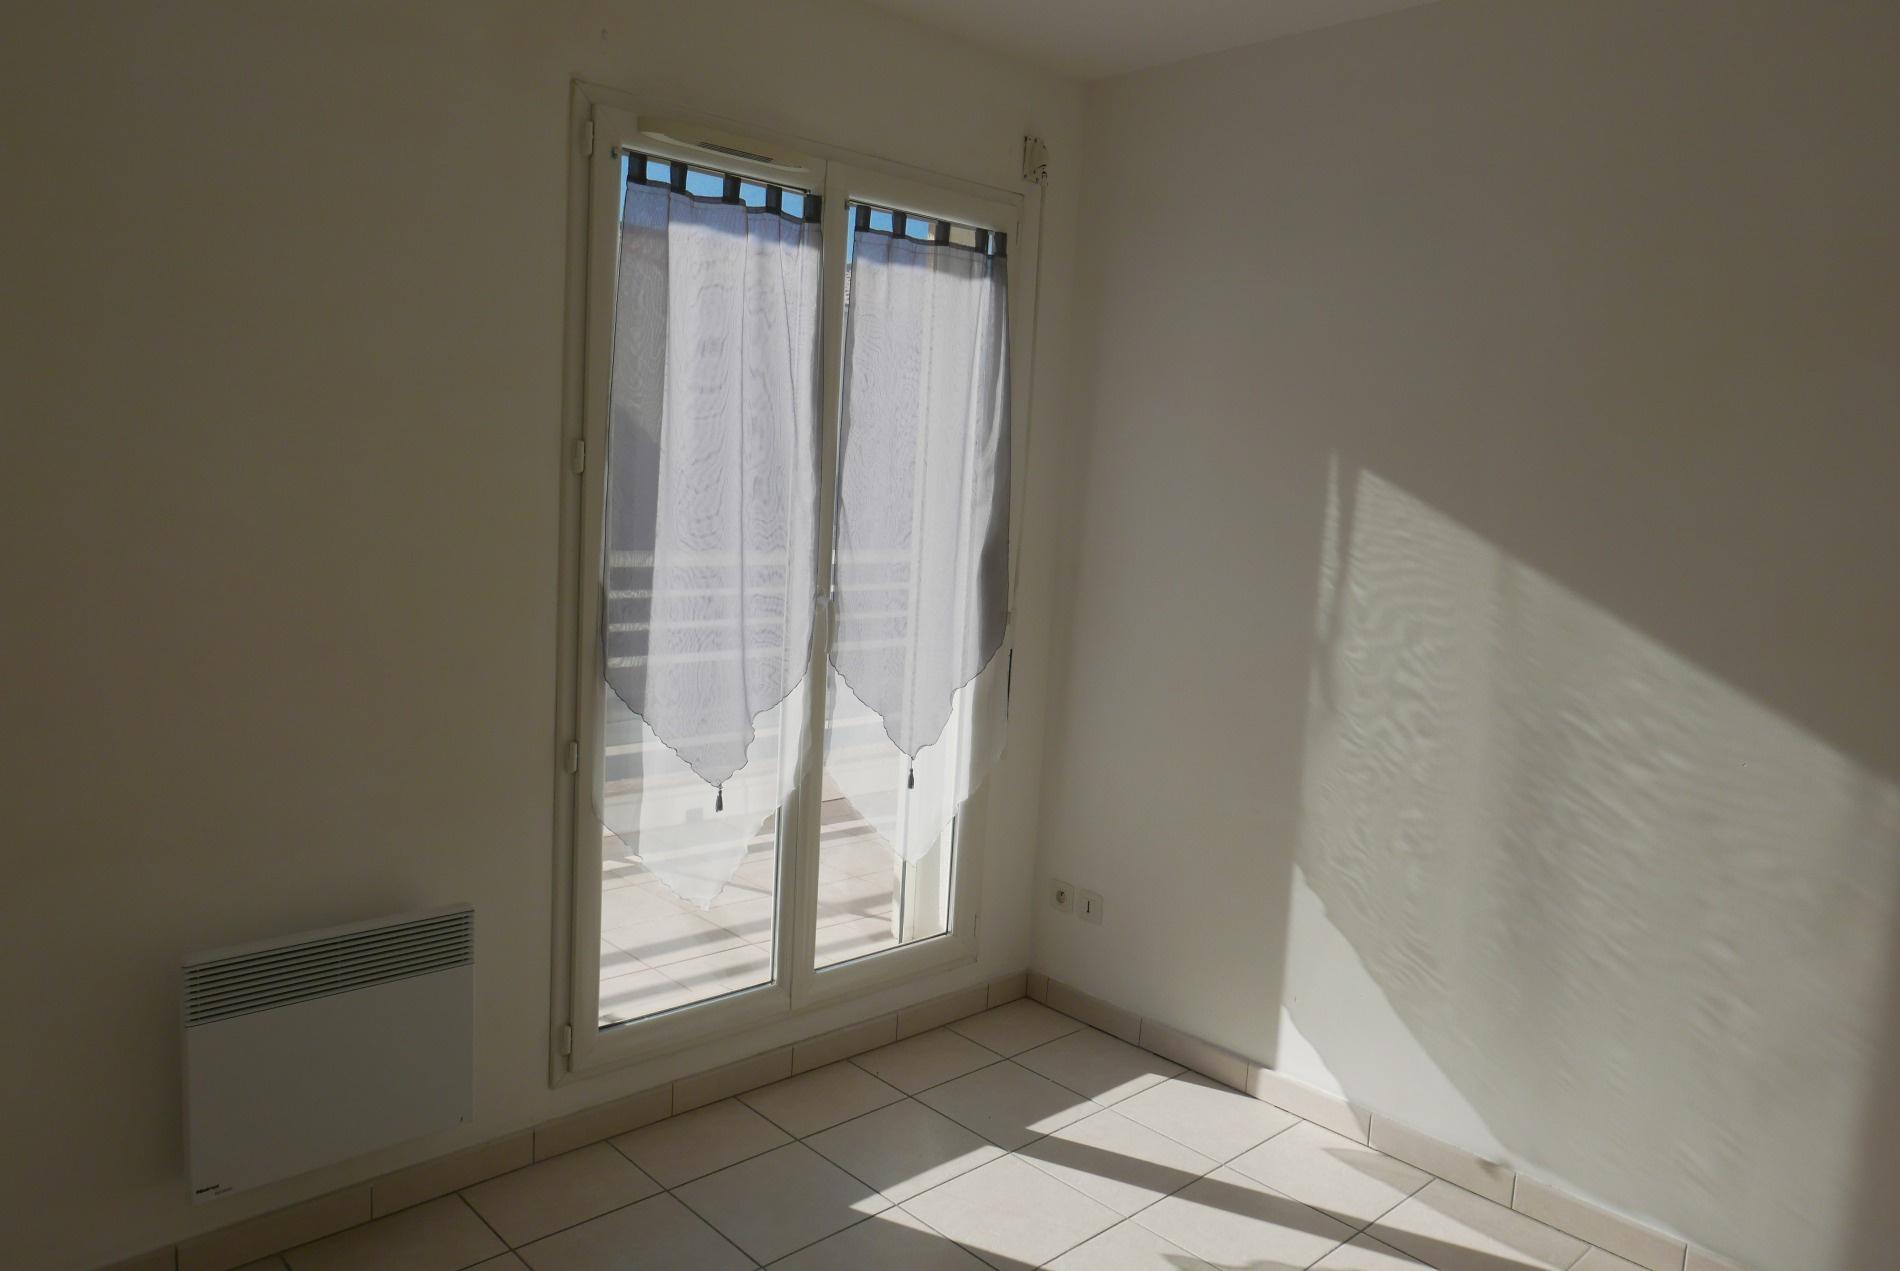 Chambre 2 etage avec balcon